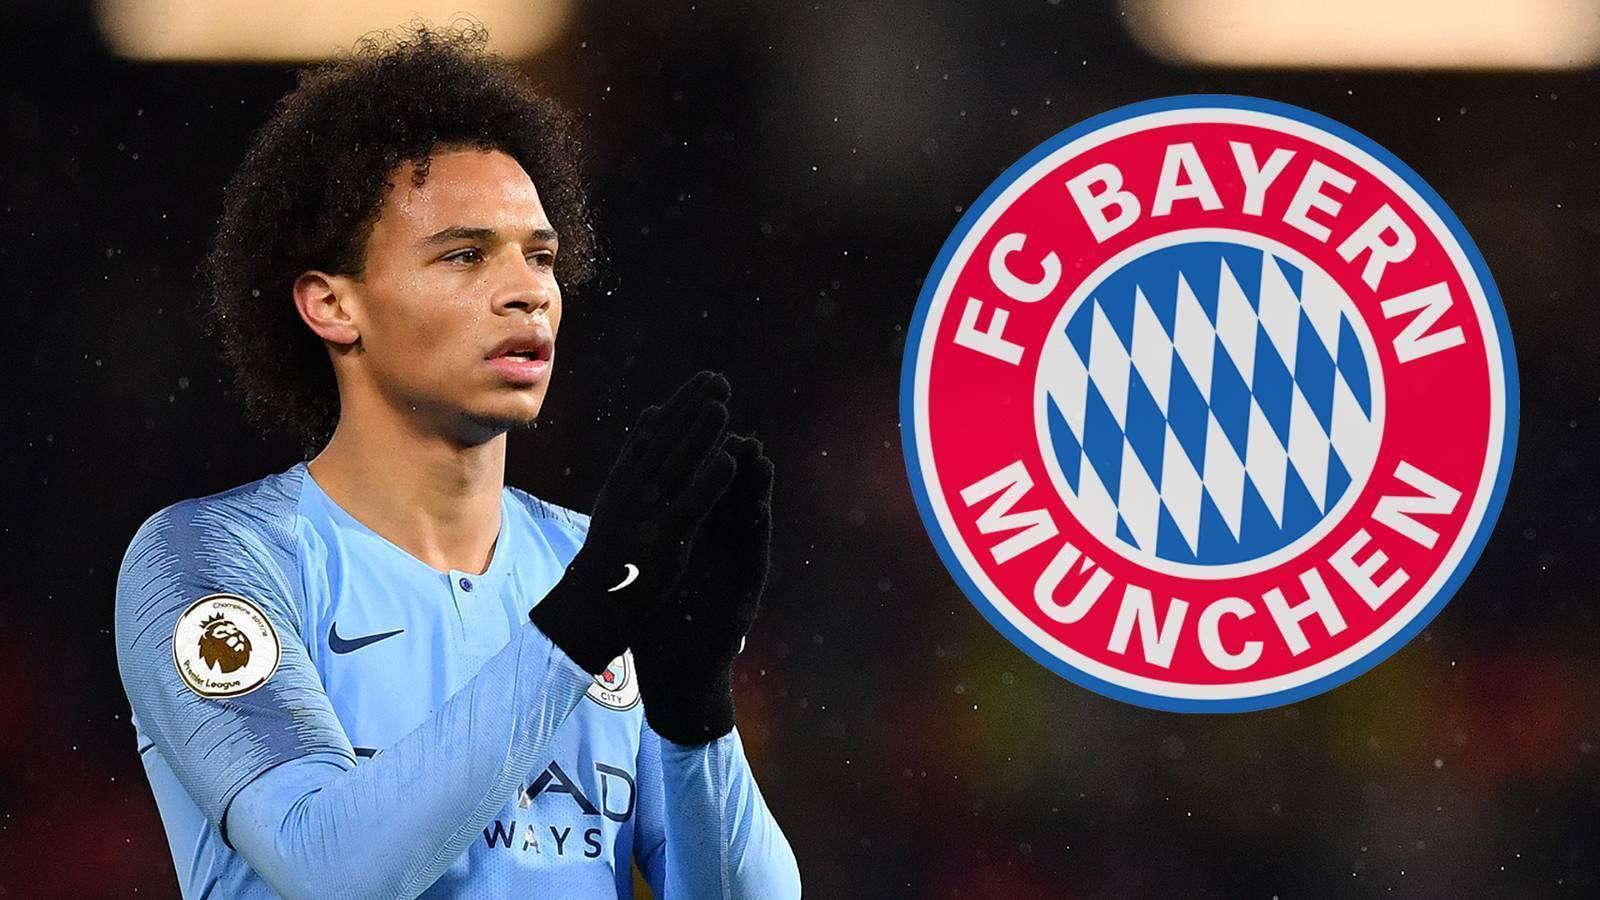 Bayern Munich edhe më afër transferimit të Sanes, City i lejon bisedimet